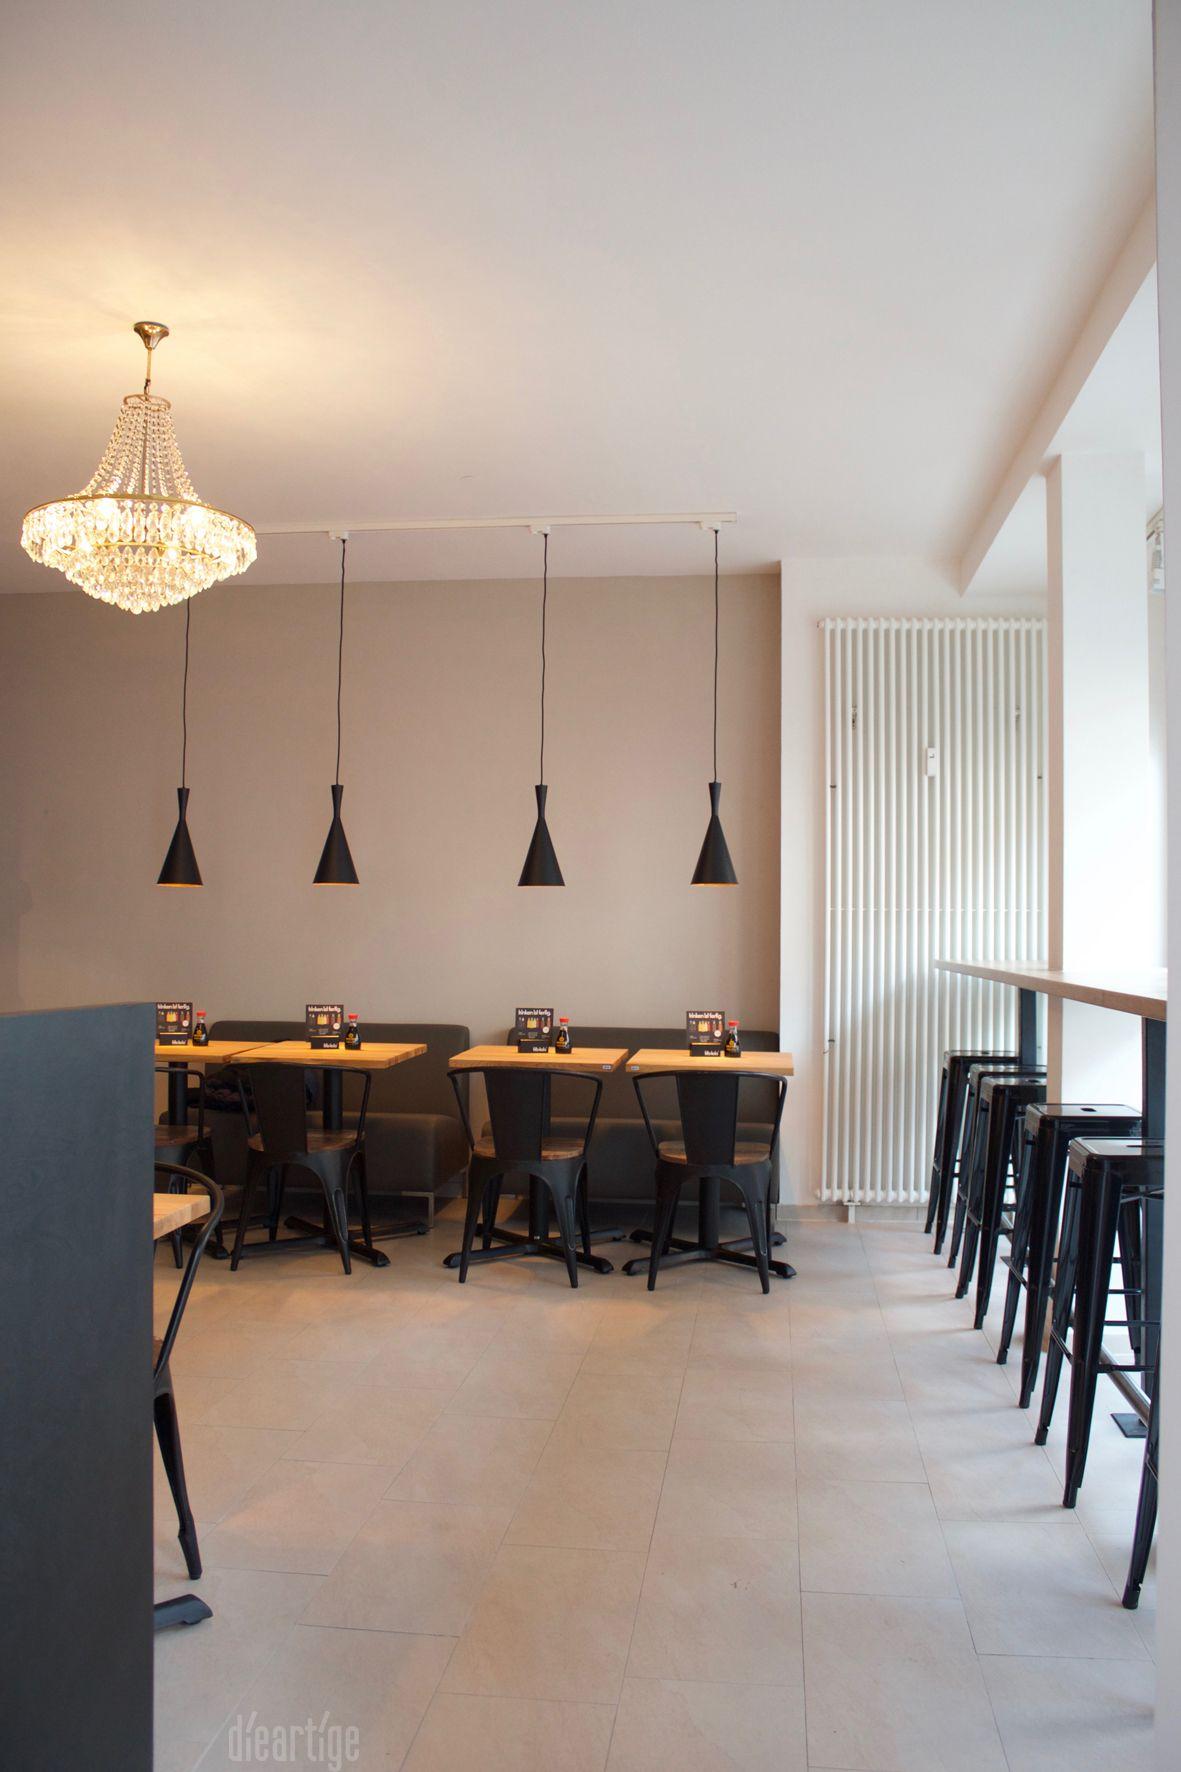 Dieartige raumplanung sushibar industrial design for Raumgestaltung cafe